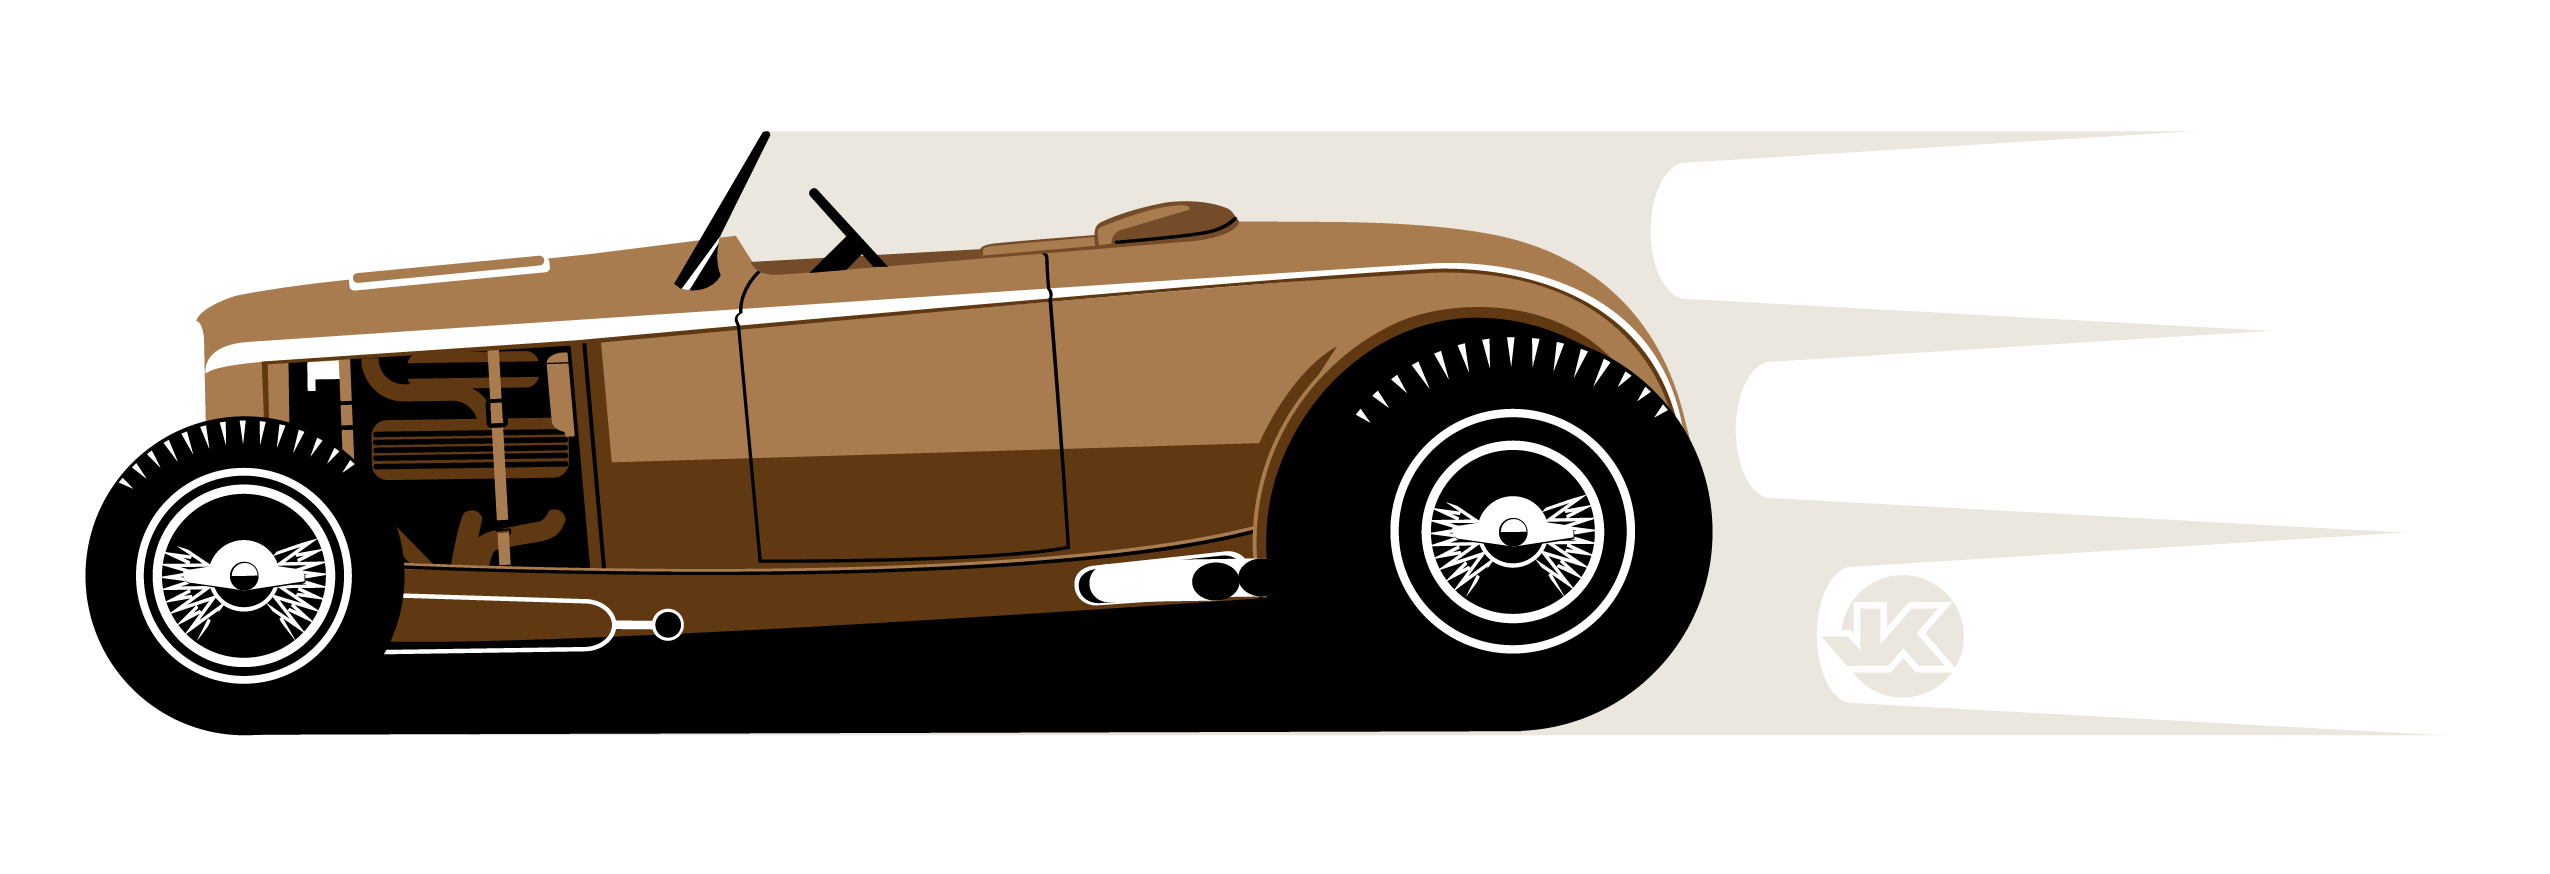 Hot Rod Suv Car Car Suv